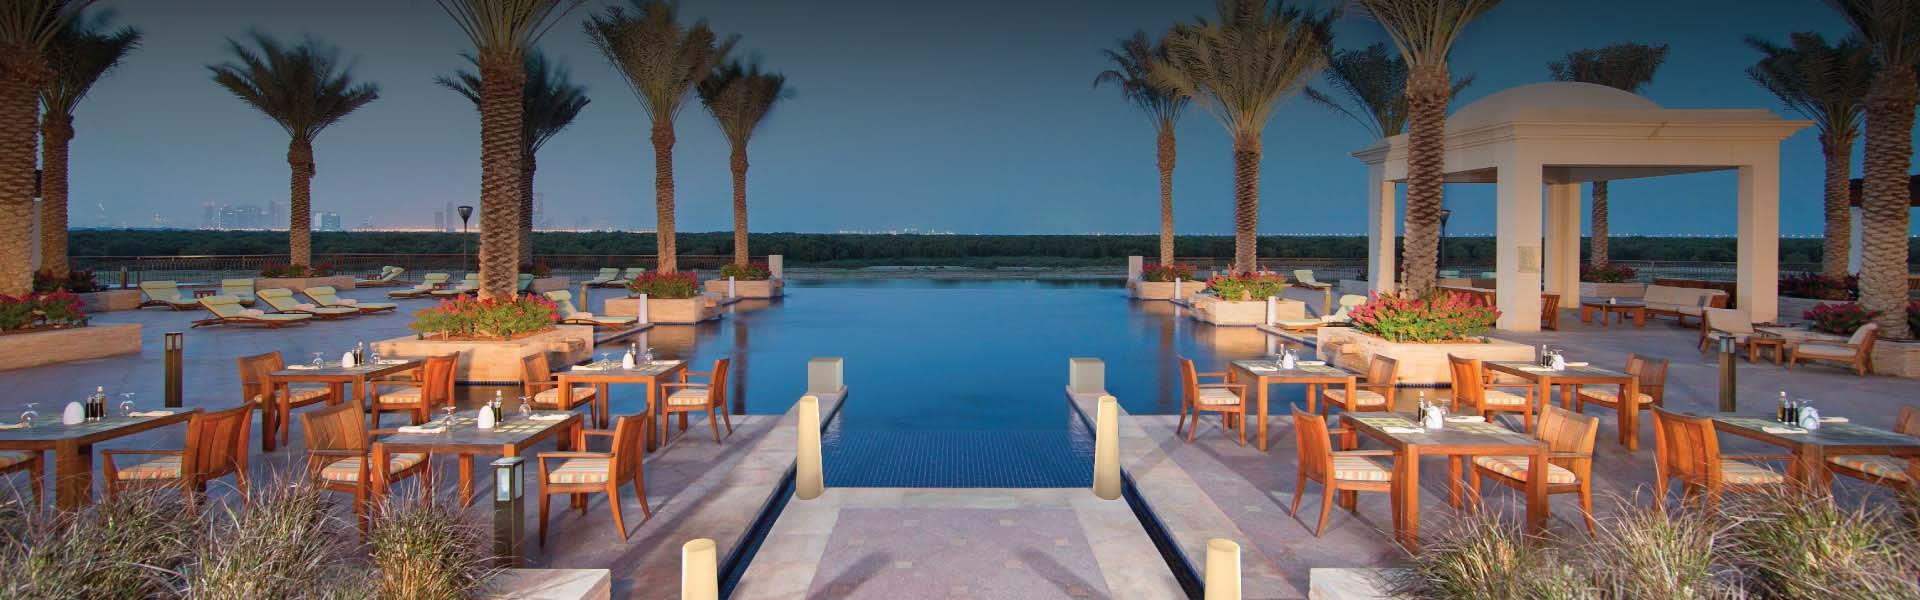 Anantara Eastern Mangroves Hotel Spa